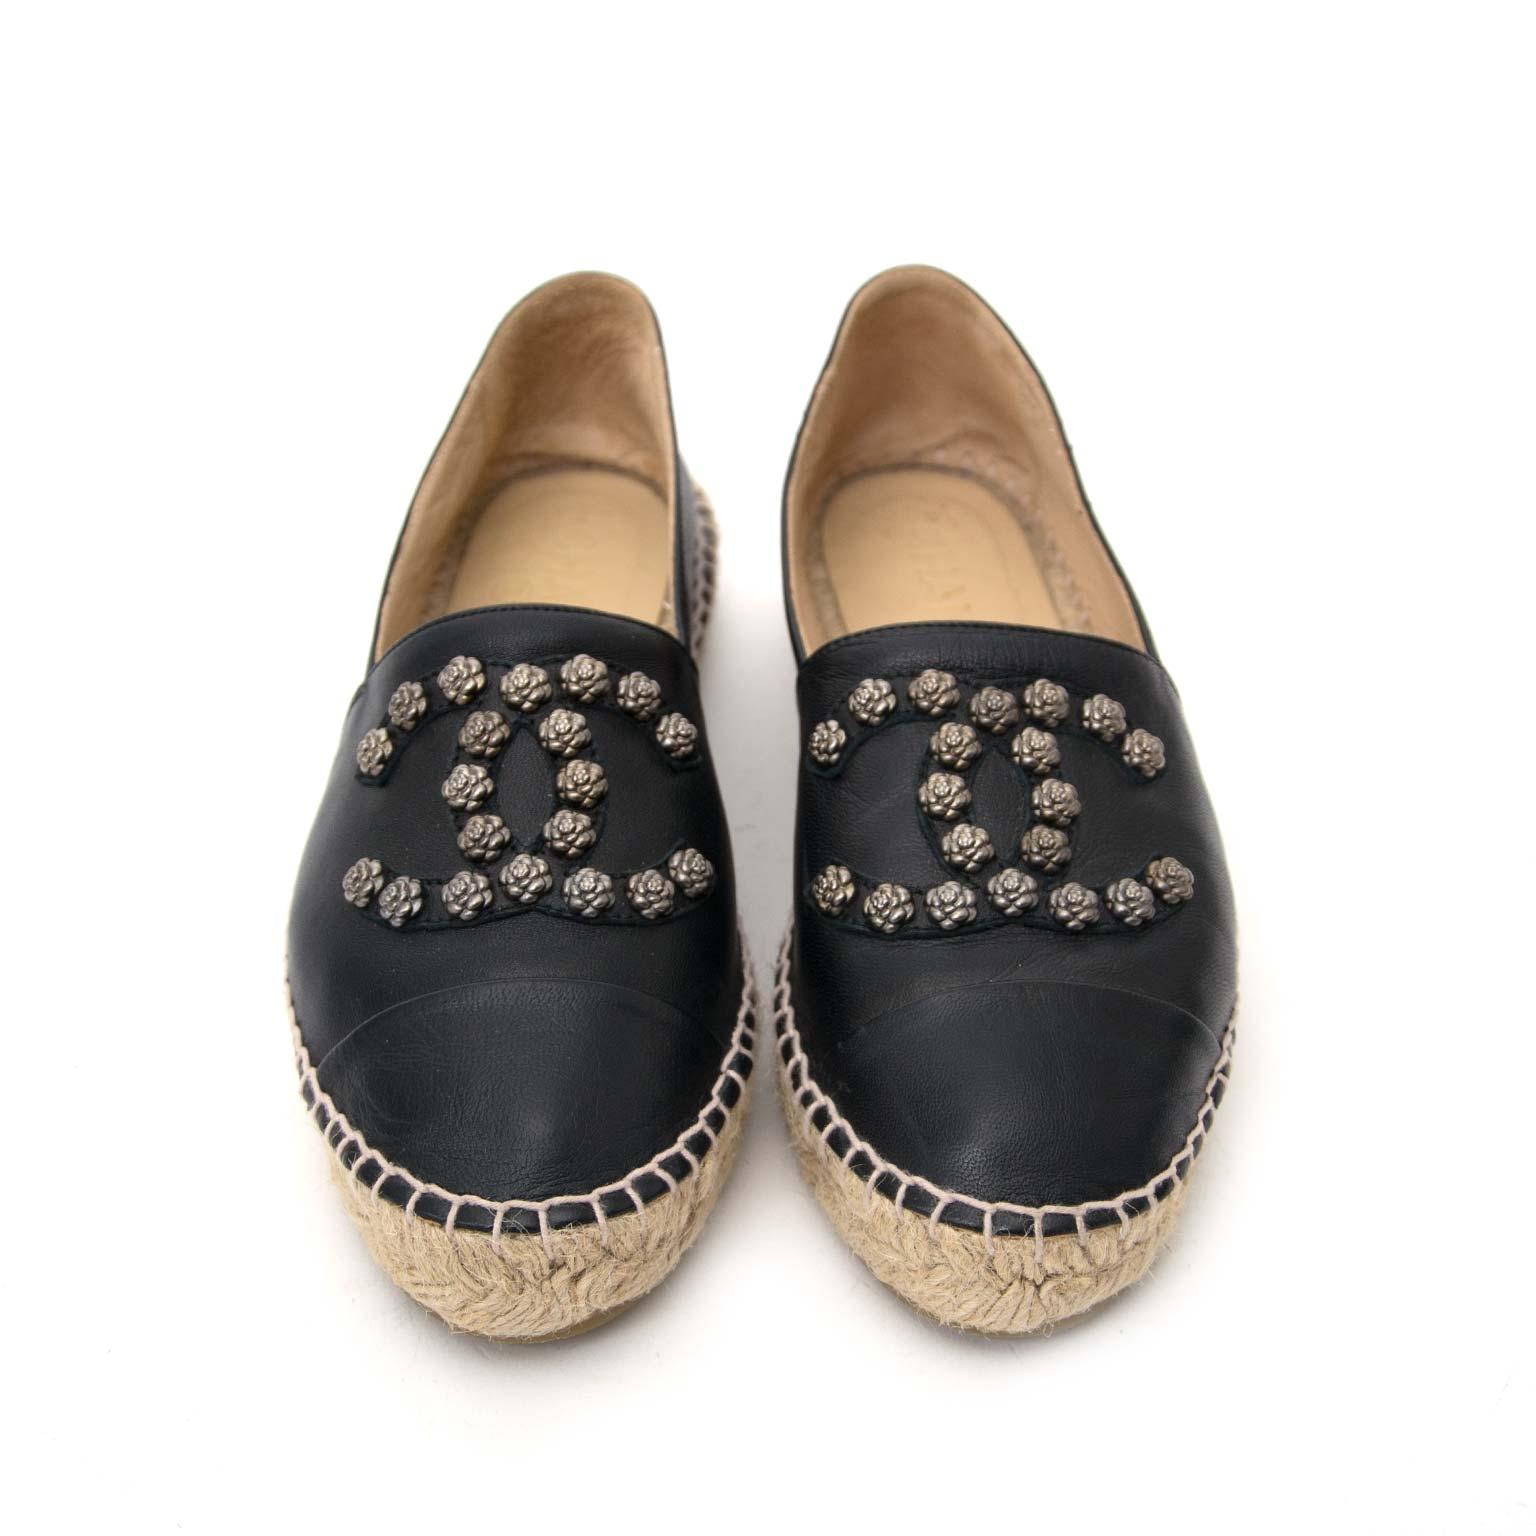 koop veilig Chanel Black Lambskin Leather Camellia CC Stud Espadrilles aan goede prijs bij Labellov, vintage webwinkel